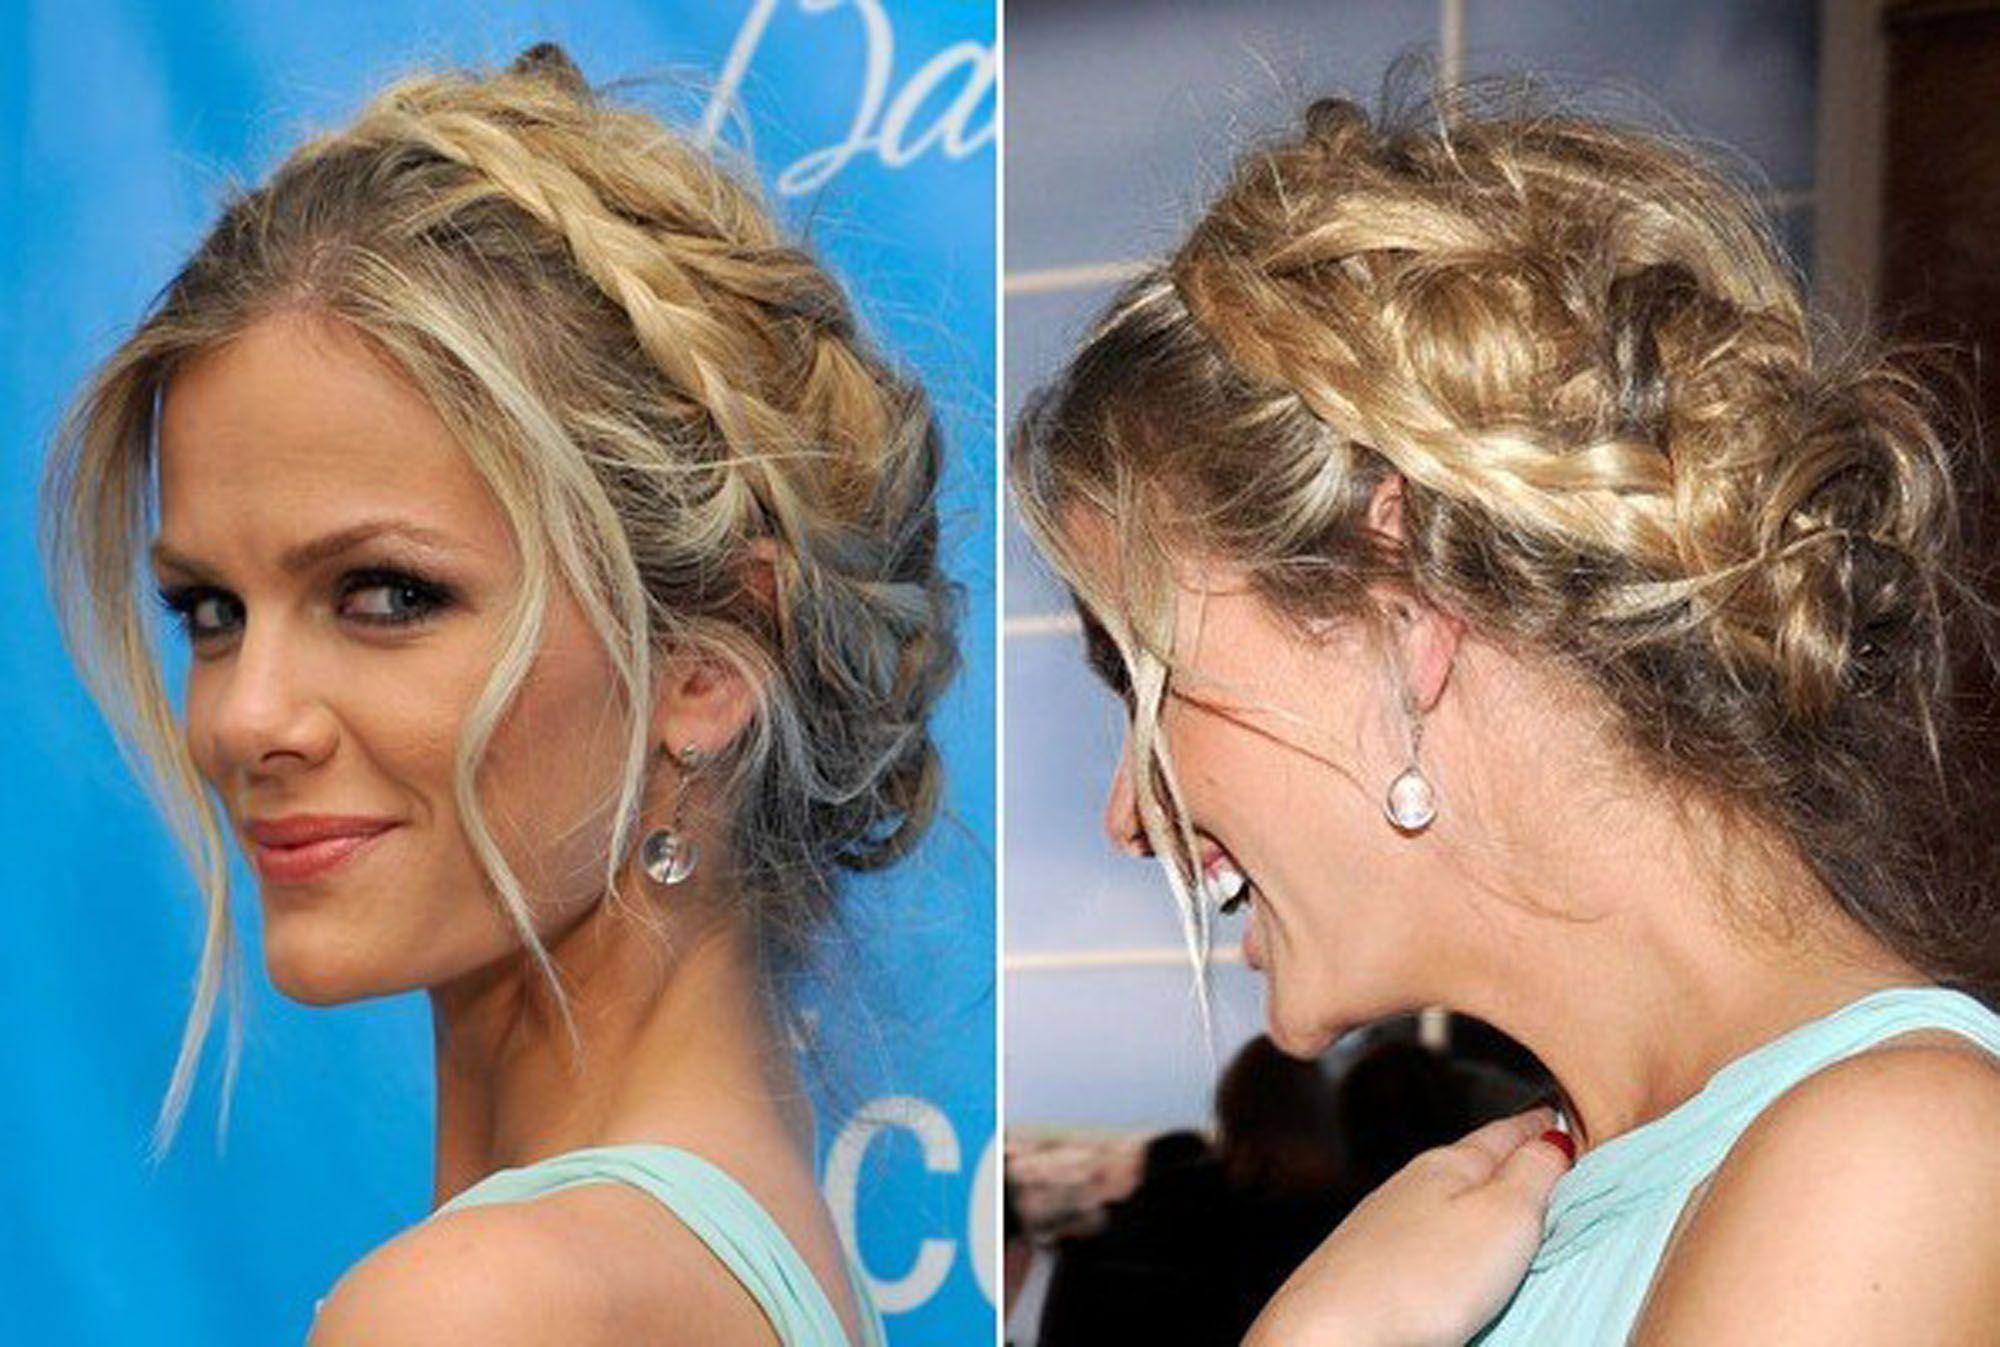 Braided Updo Hairstyles Enchanting Updo Braids Hairstyles Voguish Braided Updo Hairstyle For